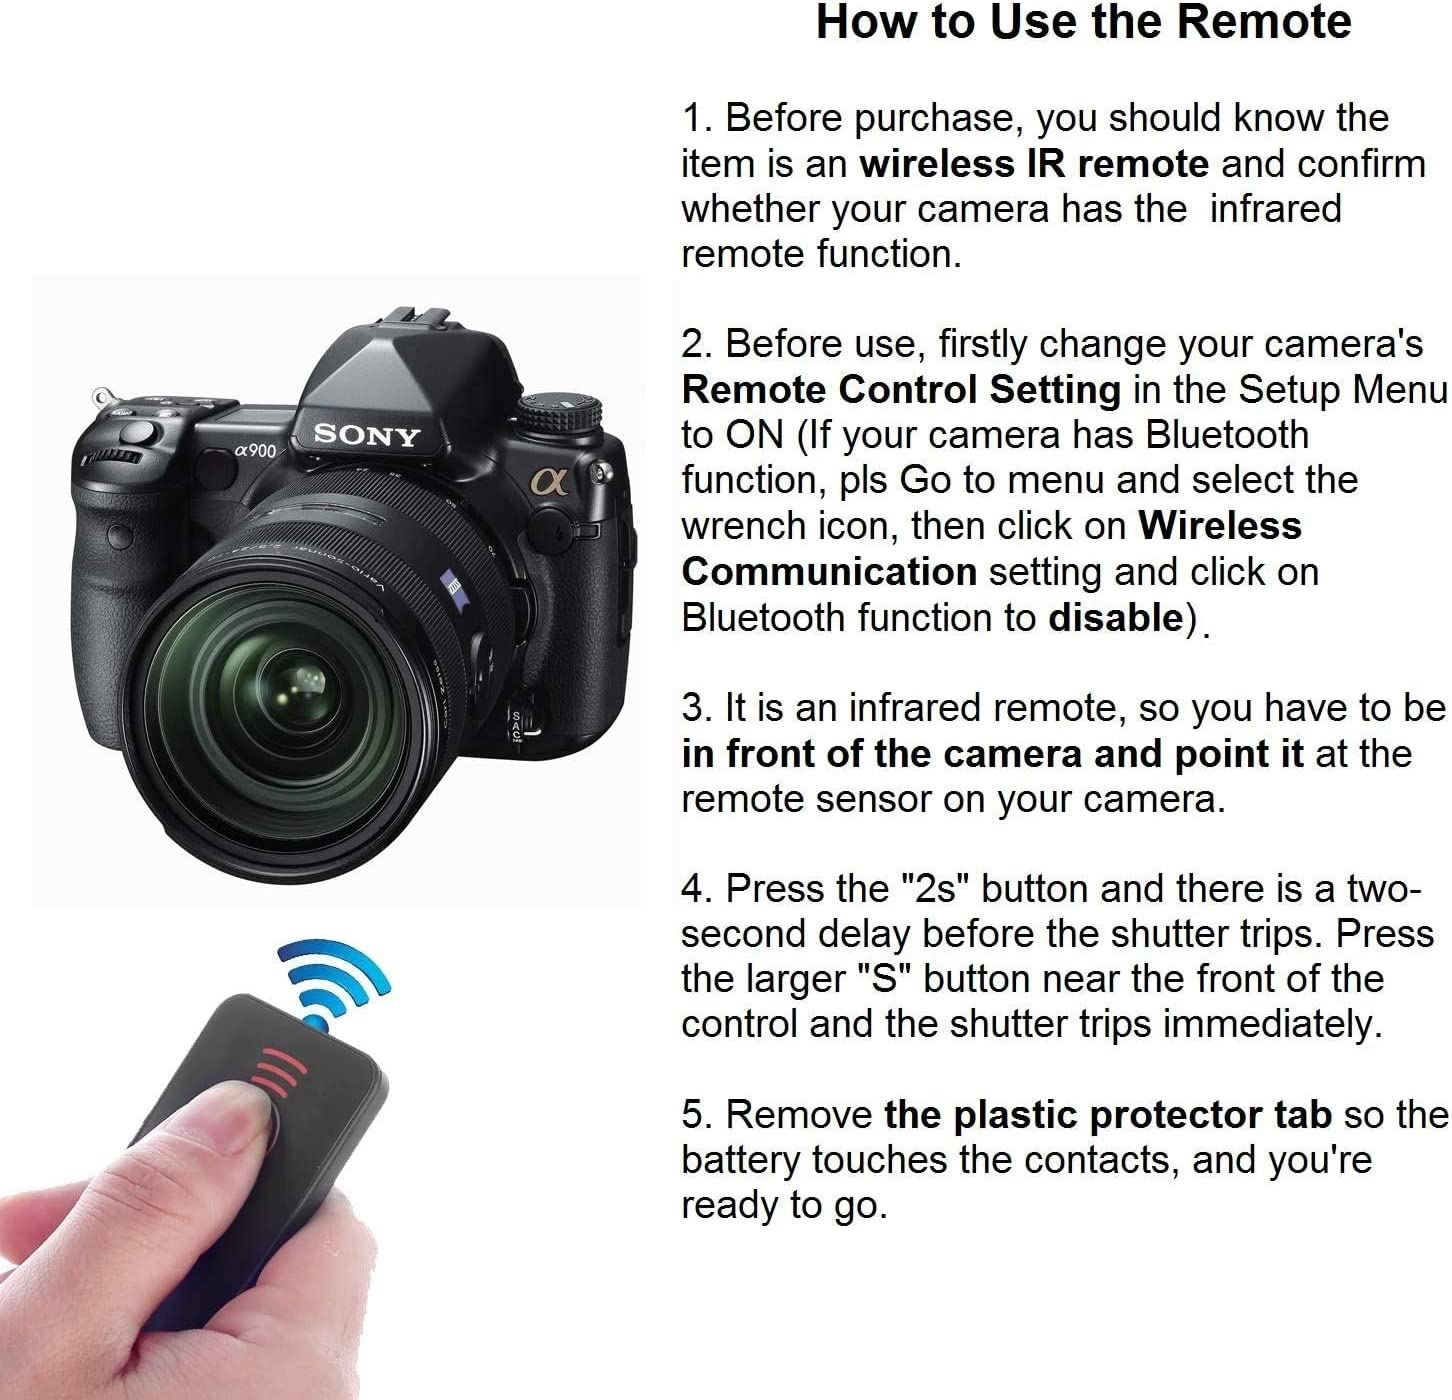 NEX-7 NEX-6 A7 II AiLove IR Wireless Remote Control Release for Sony Alpha Camera A7R III A9 A7R II A7 A7R A7S A6500 A6300 A6000 A55 A65 A77 A99 A900 A700 A580 A560 A550 A500 A450 A390 A380